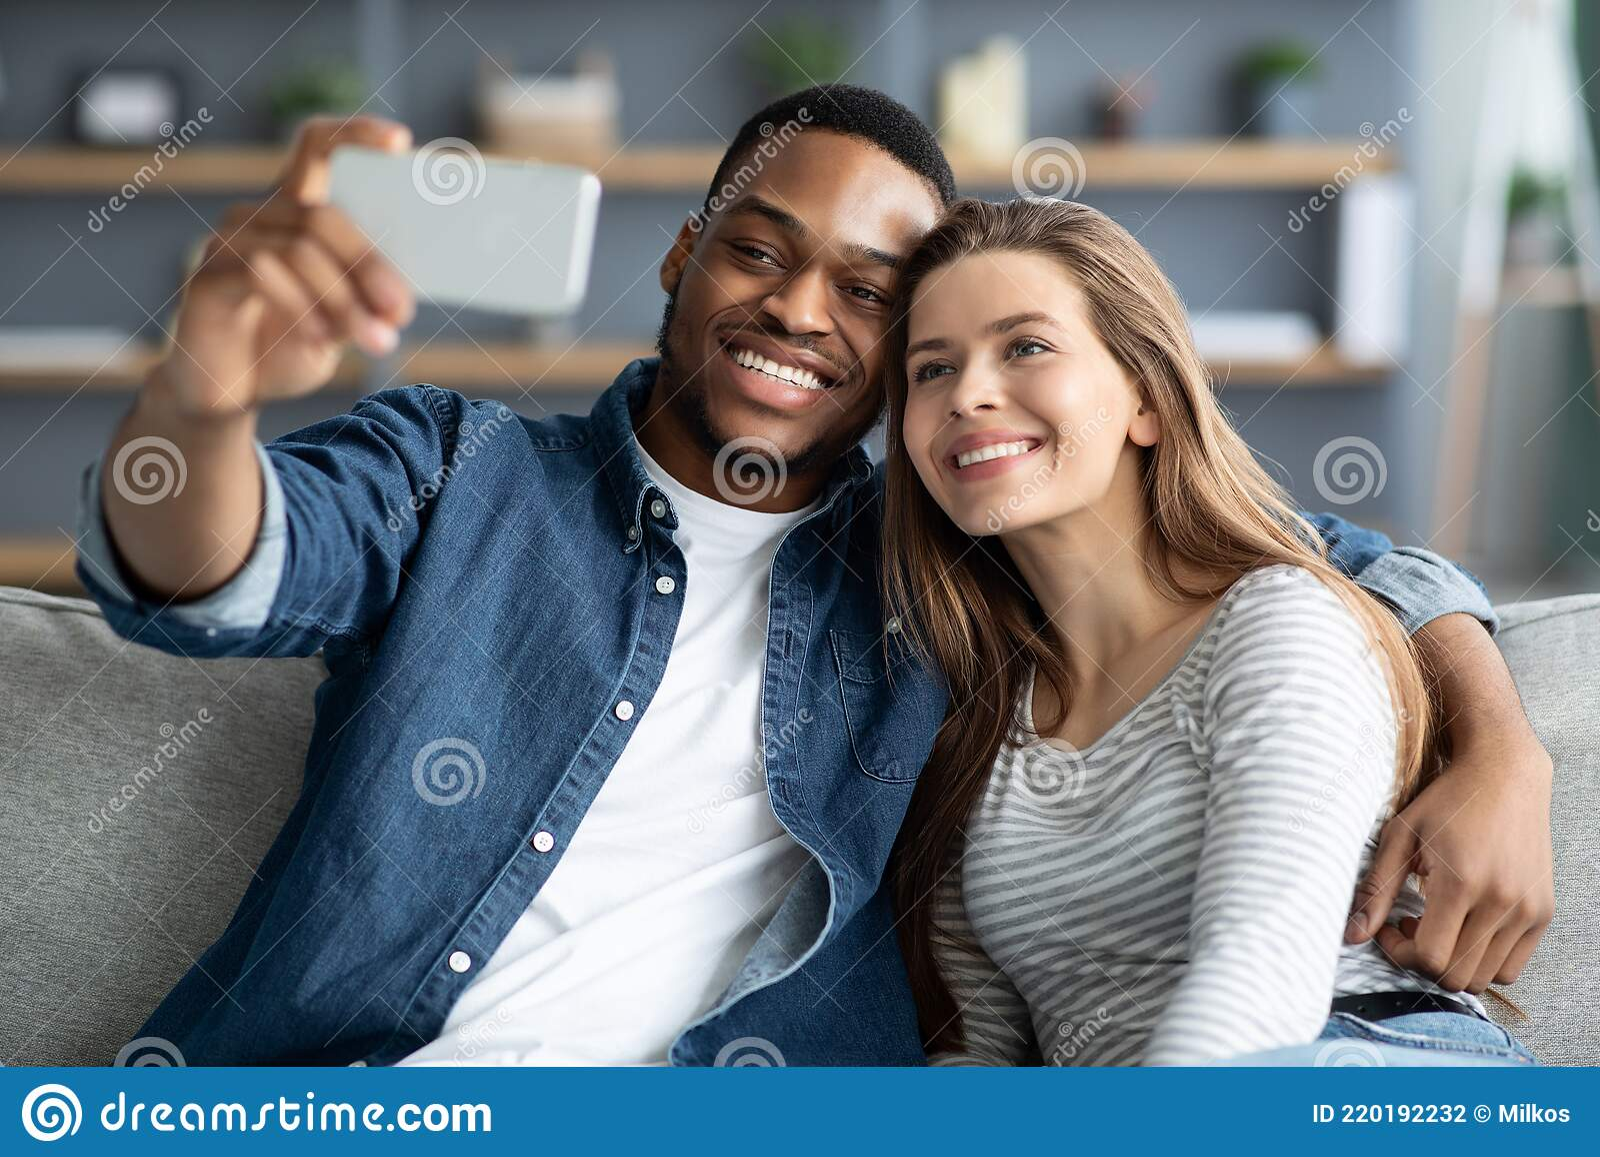 Women who love black men